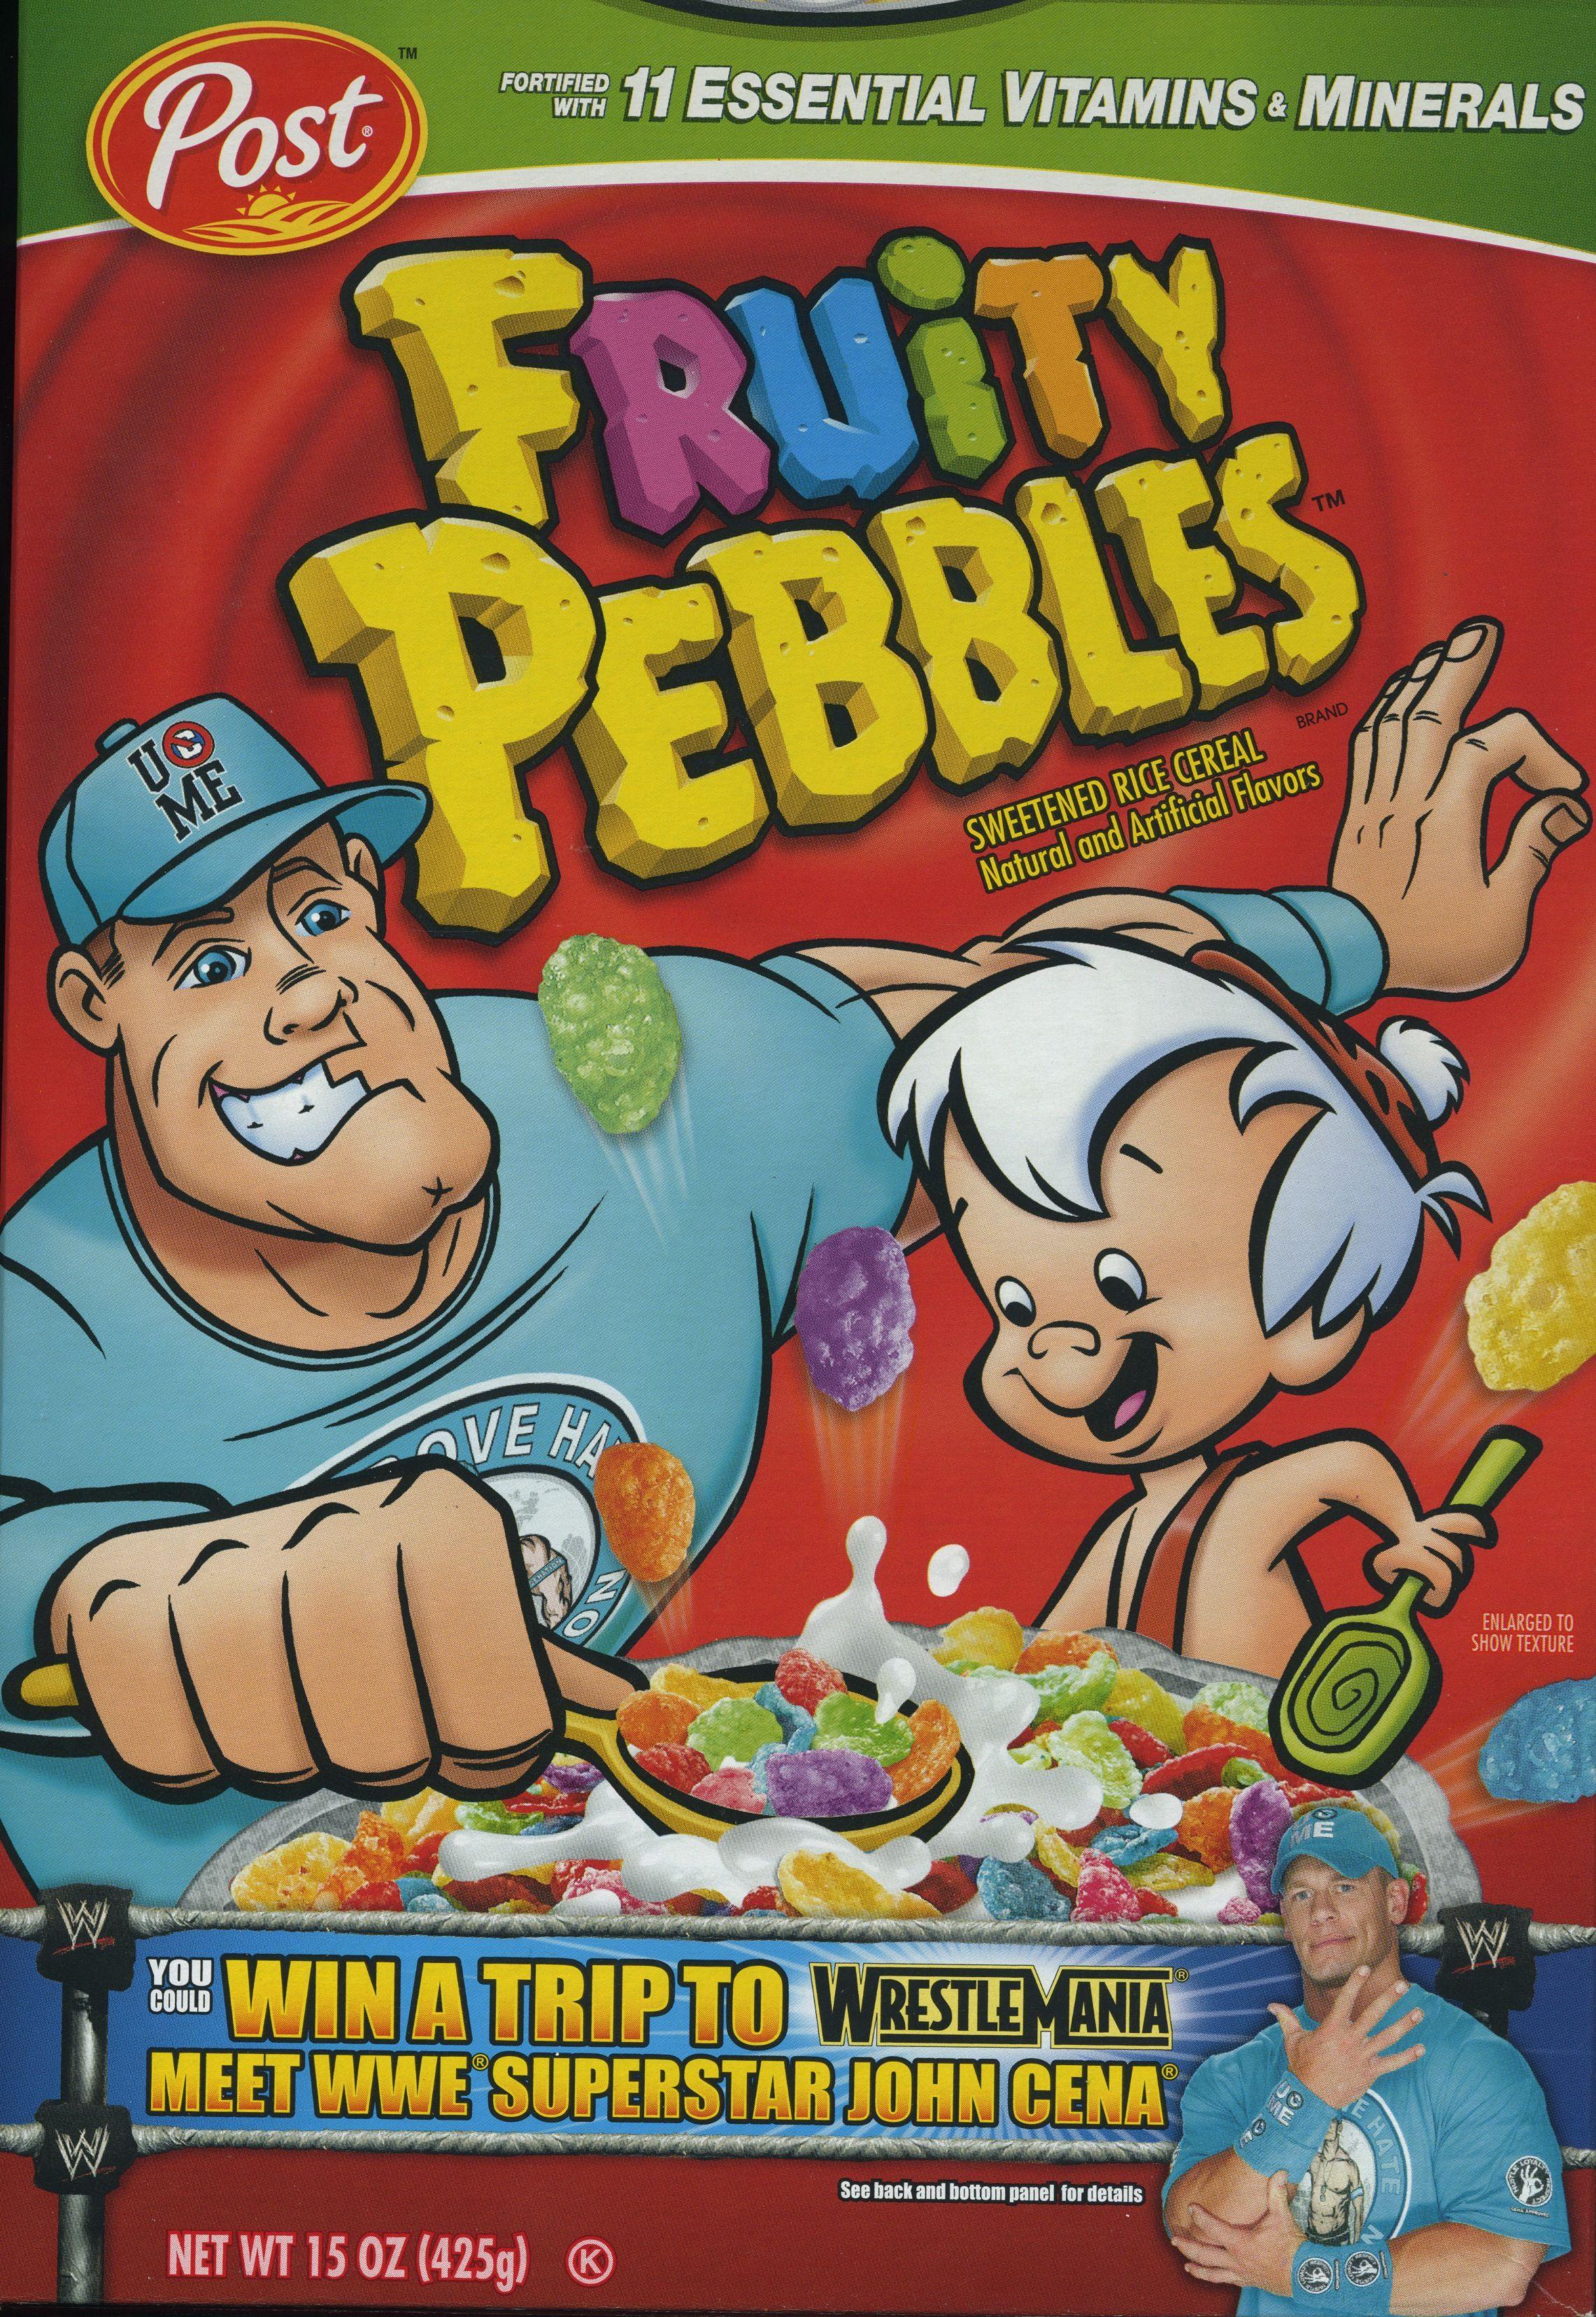 Post fruity pebbles john cena